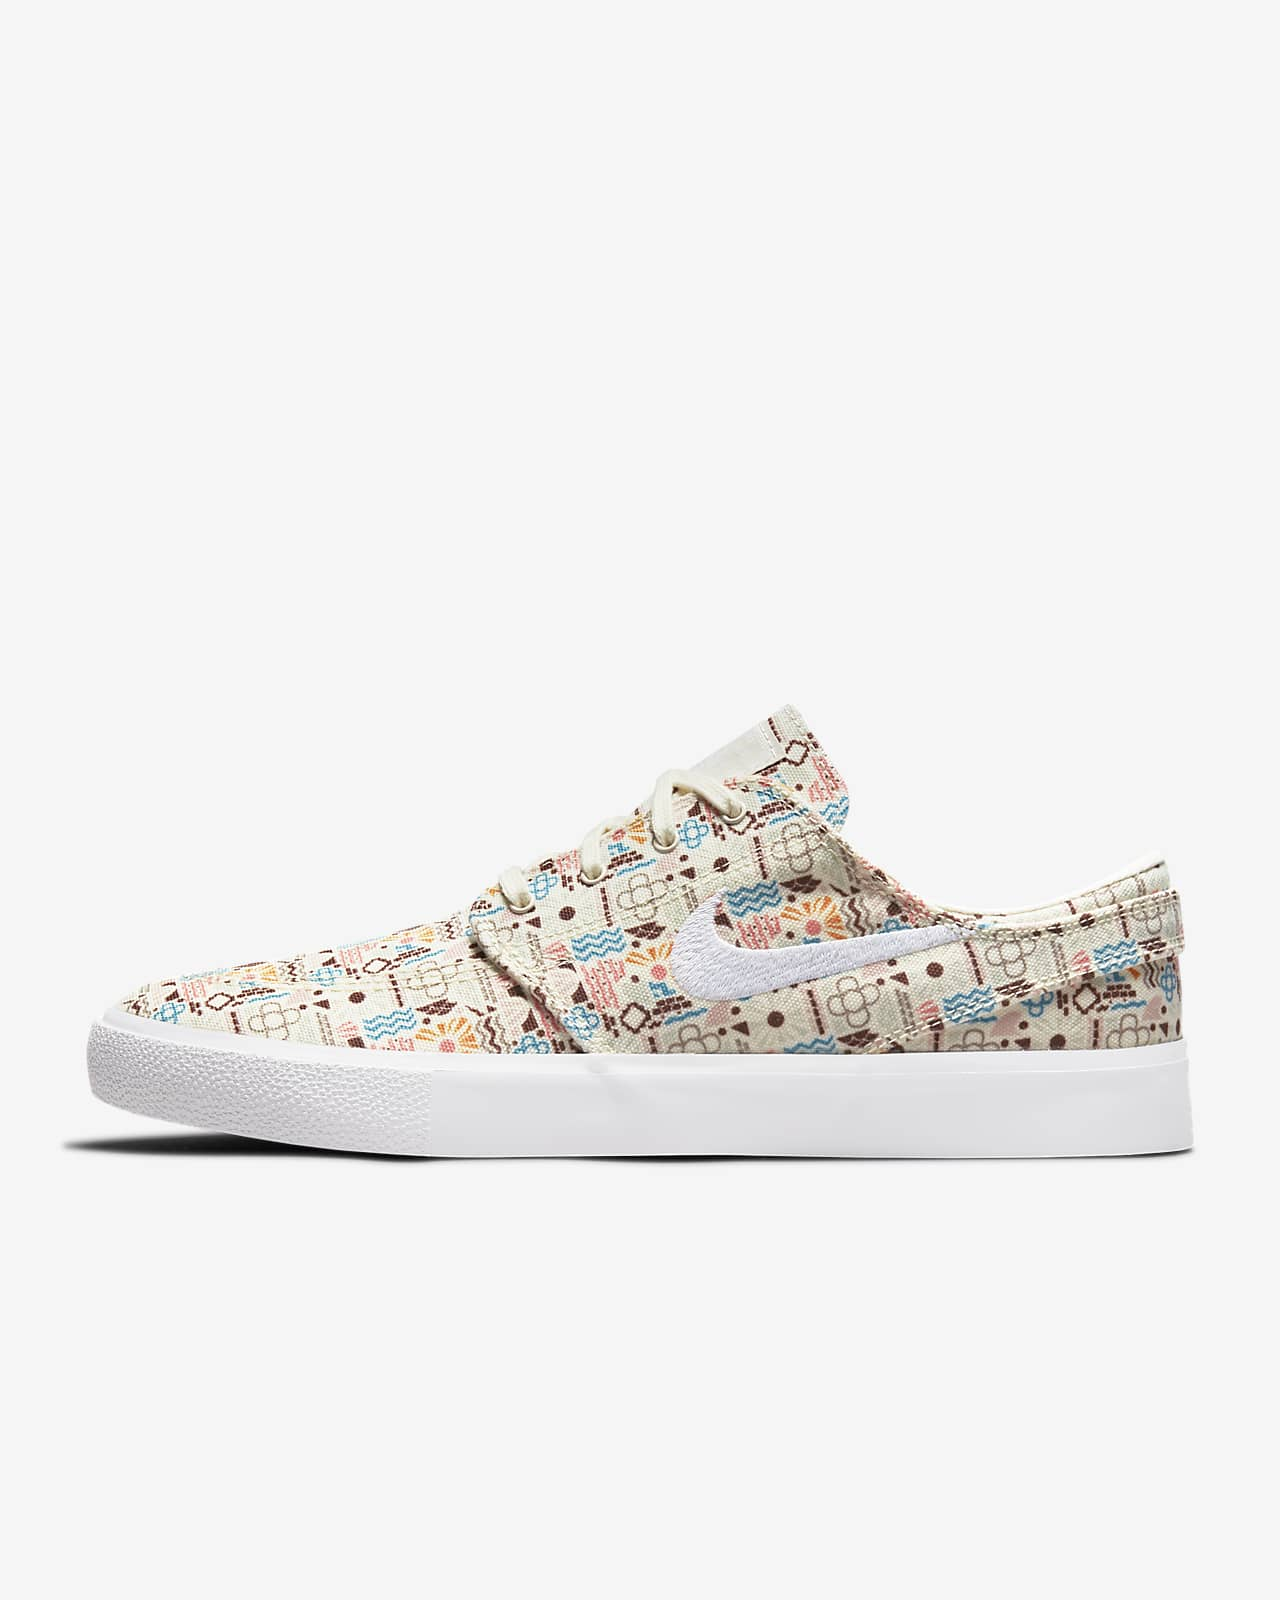 Nike SB Zoom Stefan Janoski Canvas RM Premium Skate Shoes